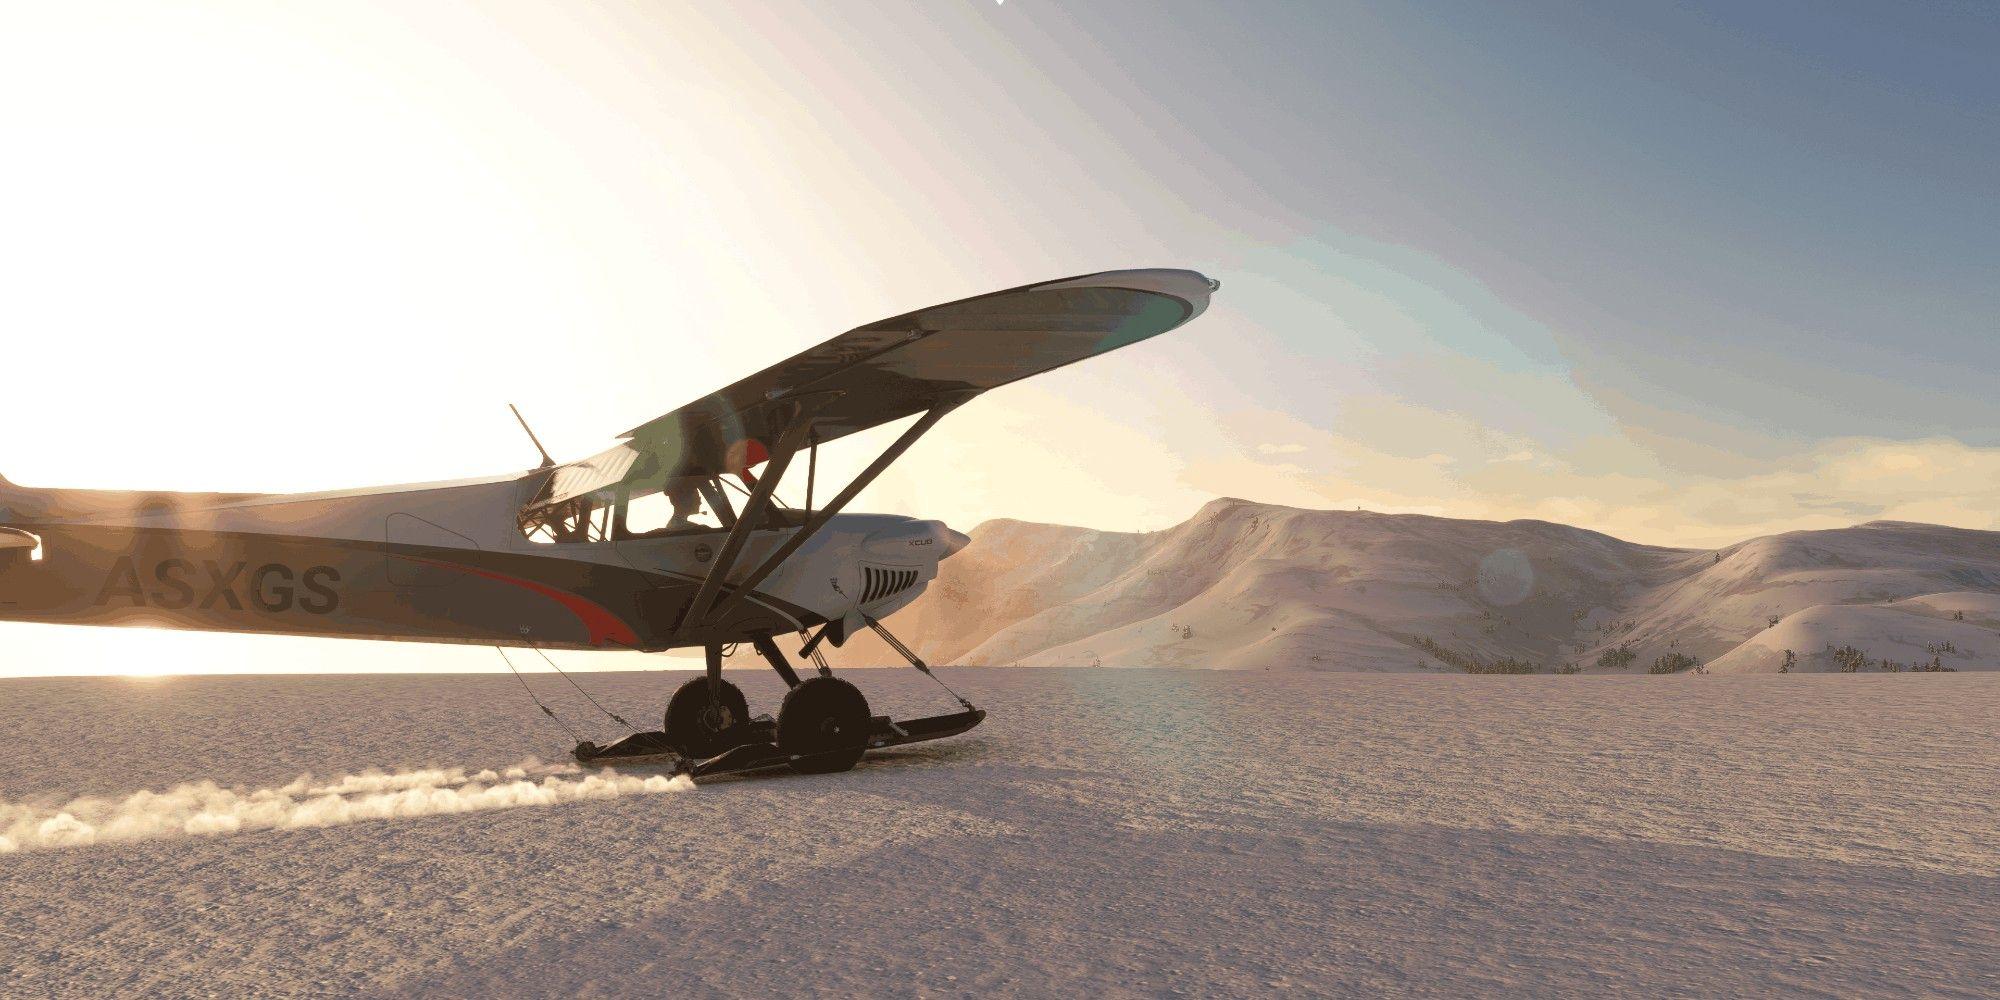 Microsoft Flight Simulator: Cómo invertir la cámara